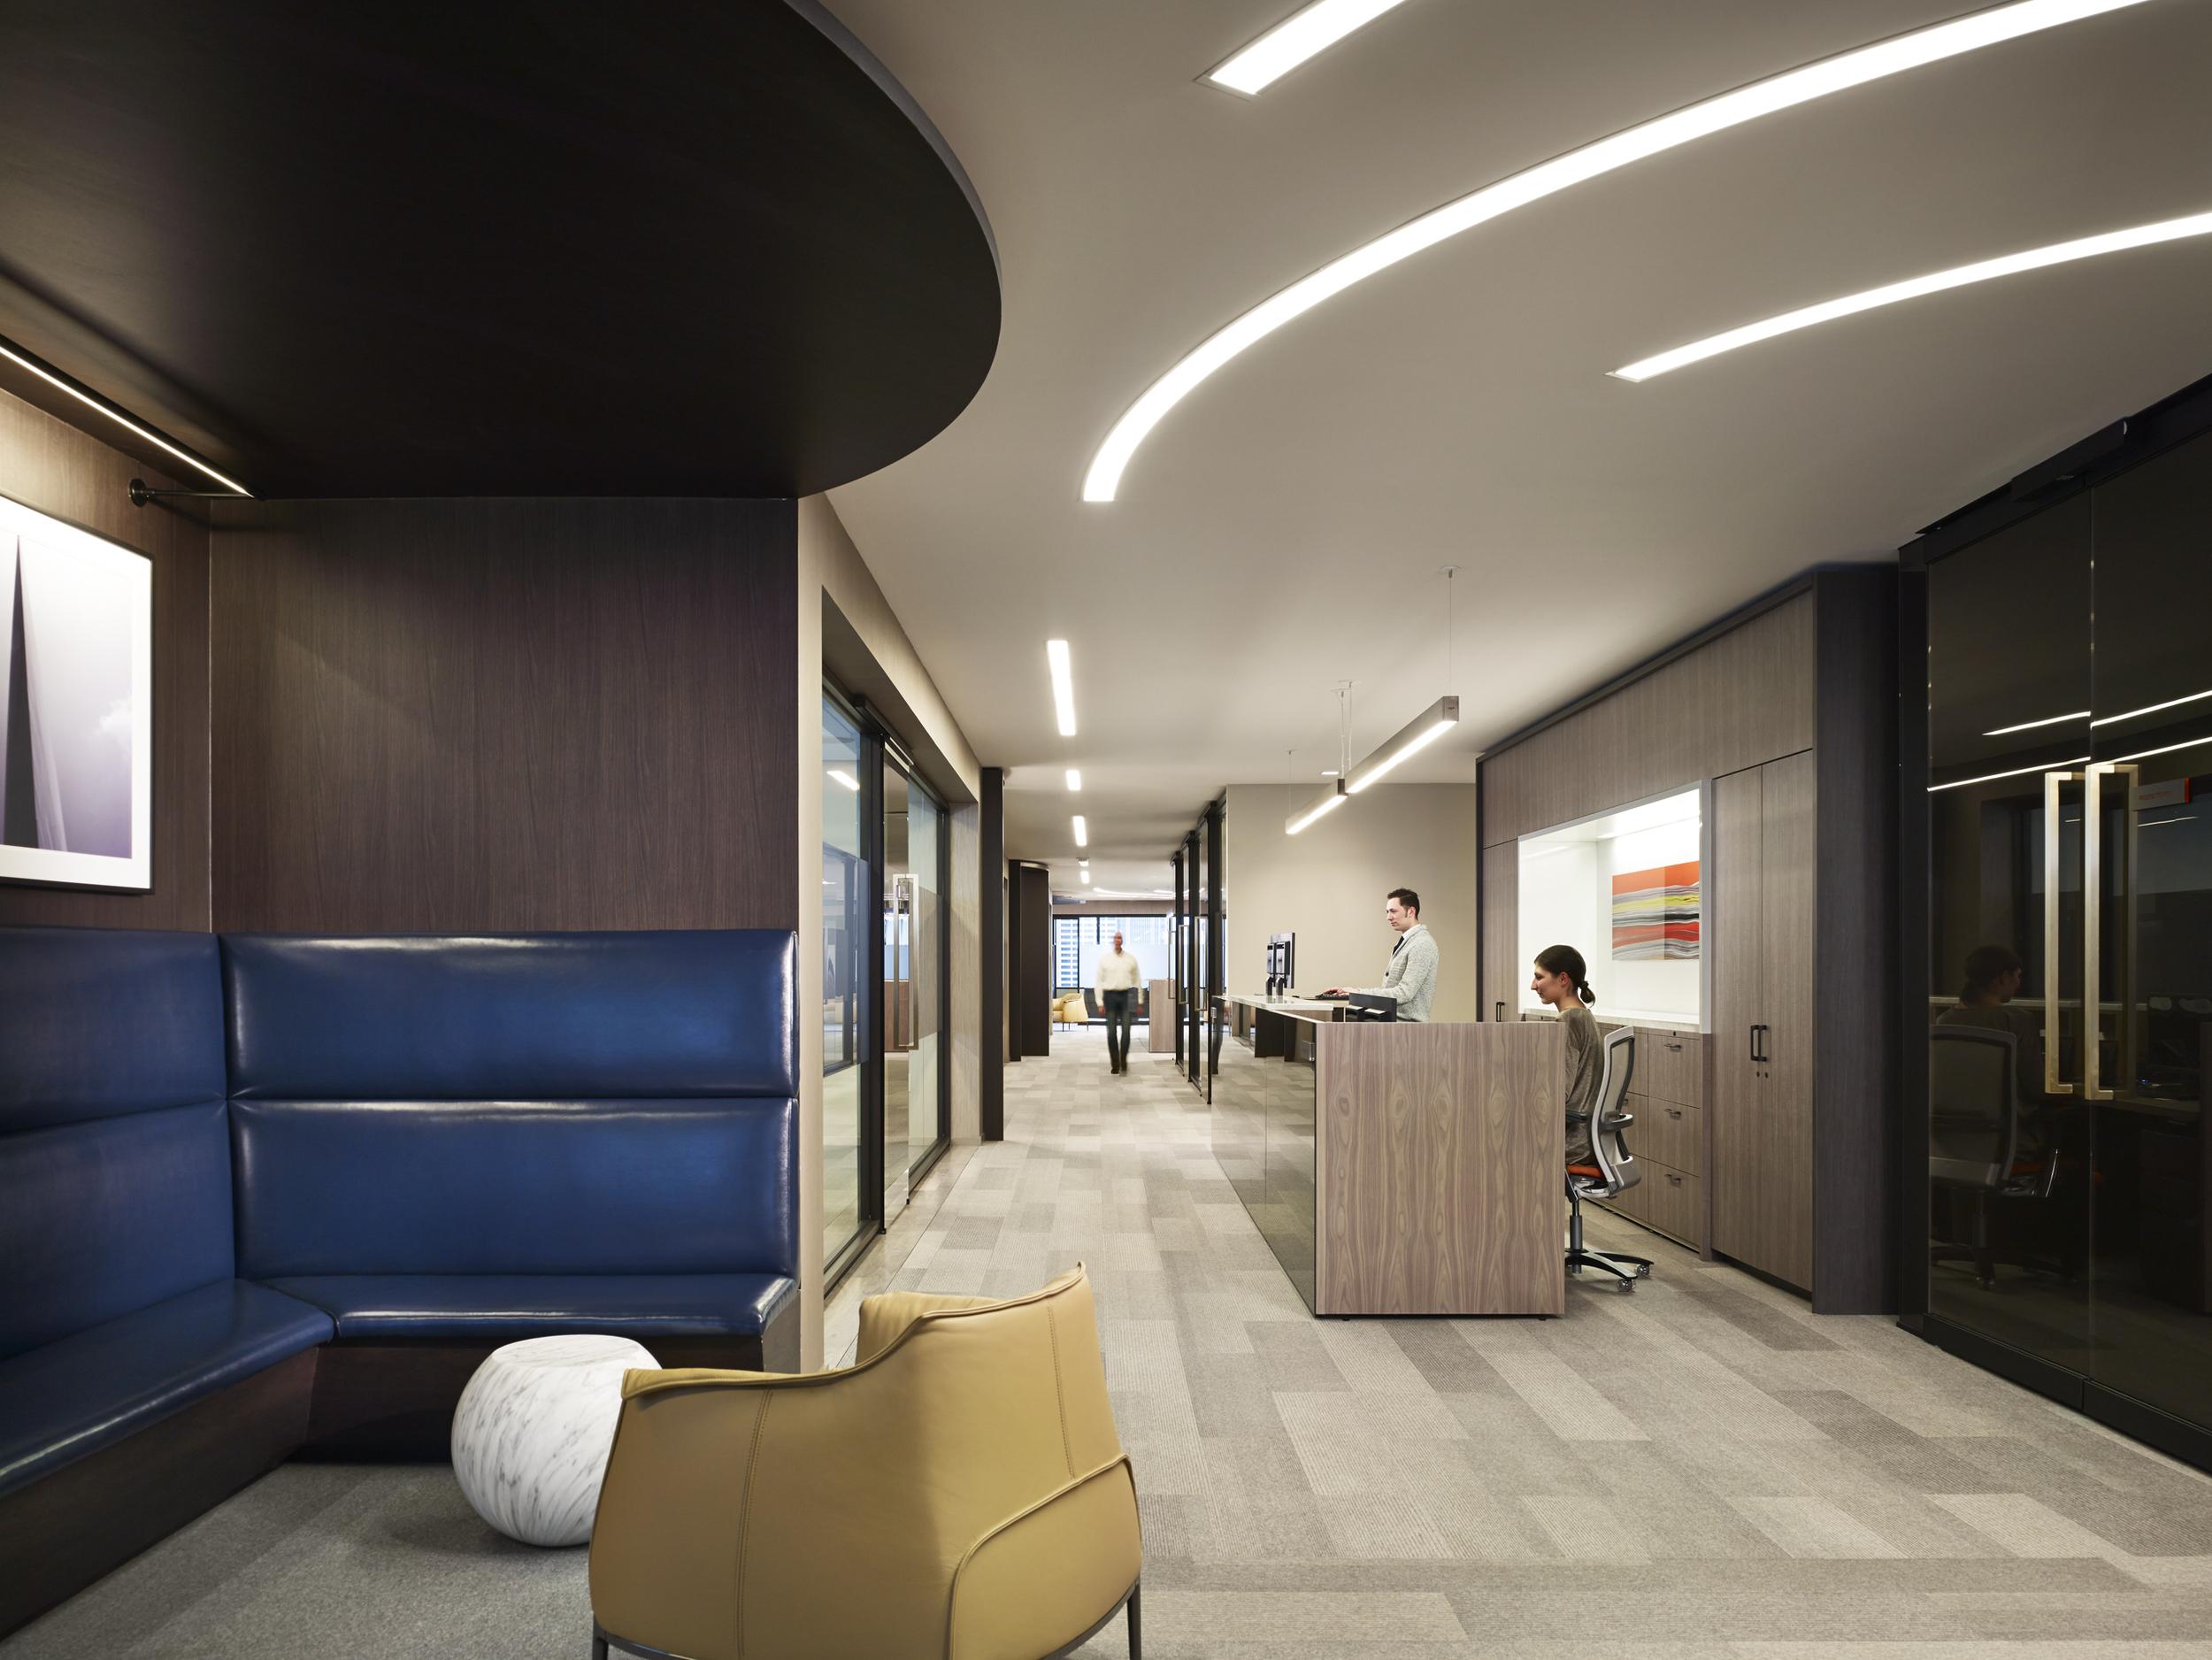 Executive Suite  Perkins+Will  Atlanta, GA     Return to Projects